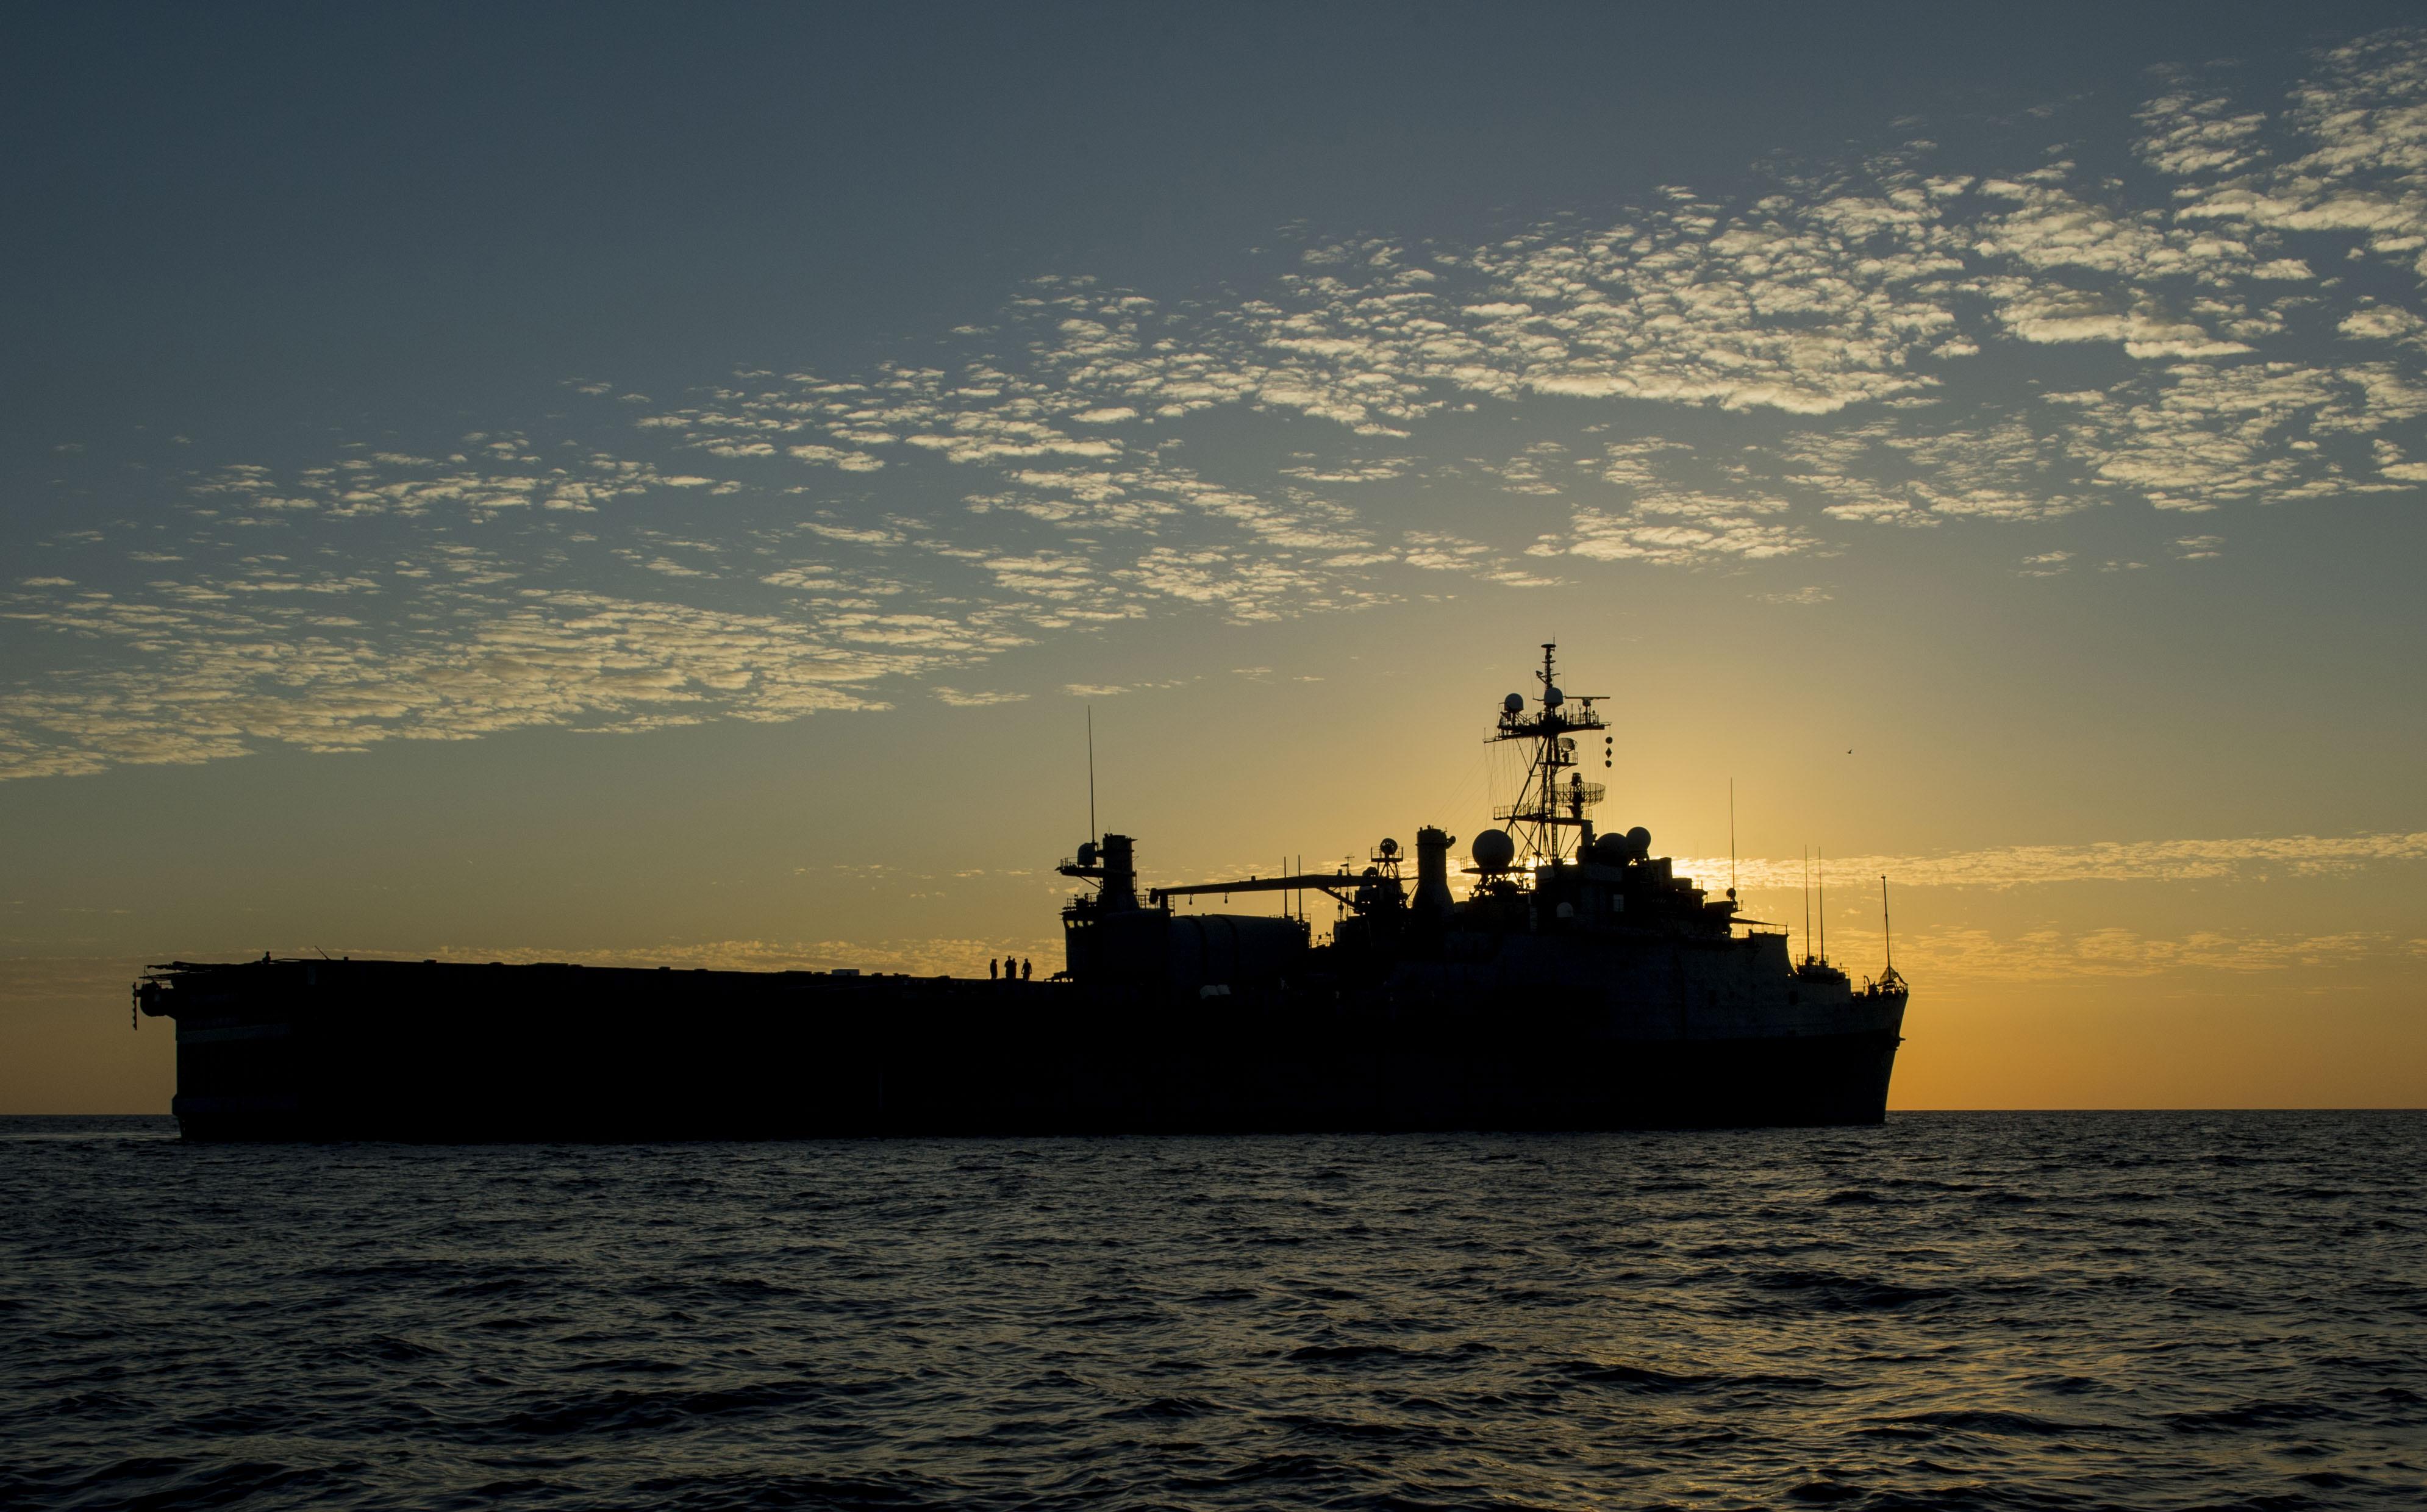 Houthi attack on ship act of terrorism: UAE